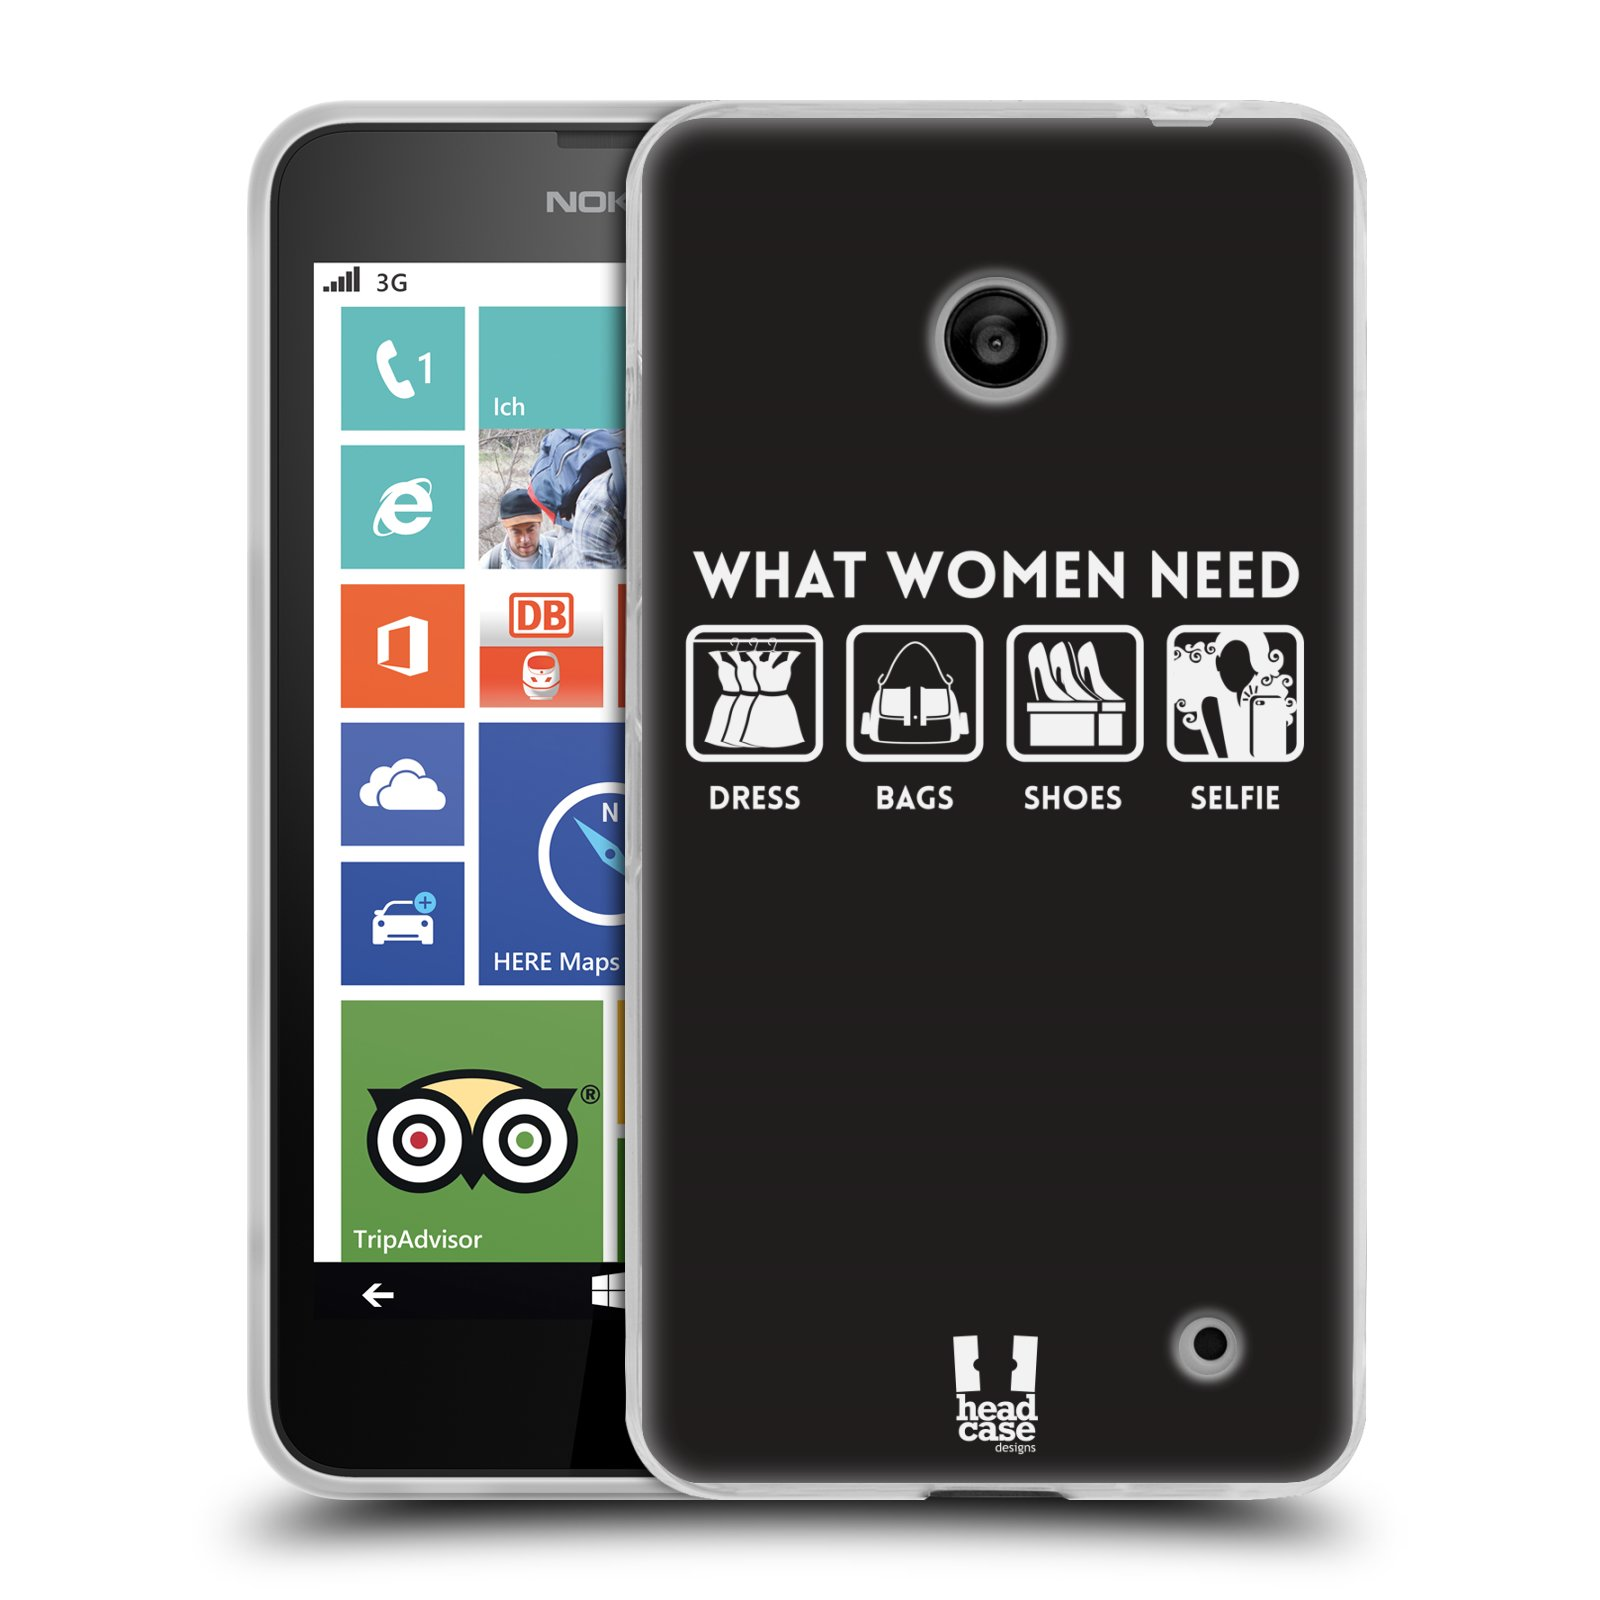 Silikonové pouzdro na mobil Nokia Lumia 630 HEAD CASE POTŘEBY ŽENY (Silikonový kryt či obal na mobilní telefon Nokia Lumia 630 a Nokia Lumia 630 Dual SIM)